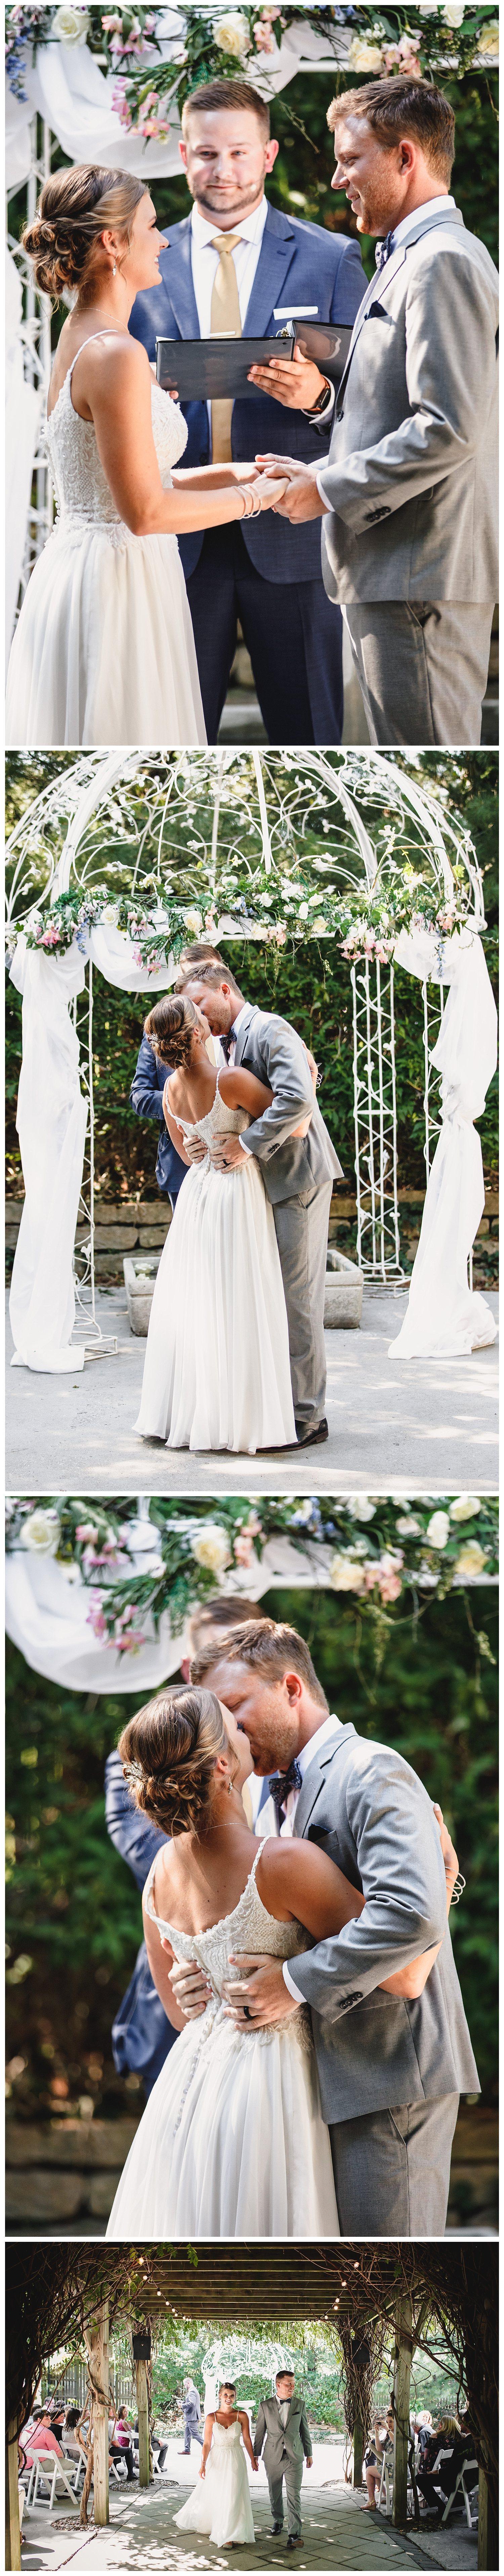 Kelsey_Diane_Photography_Kansas_City_Engagement_Wedding_Photographer_Midwest_Traveling_Missouri_Lee_Andrew_Hall_And_Garden_Blue_Springs_Wedding_Clayton_Kimberly_Summer_Wedding_0837.jpg